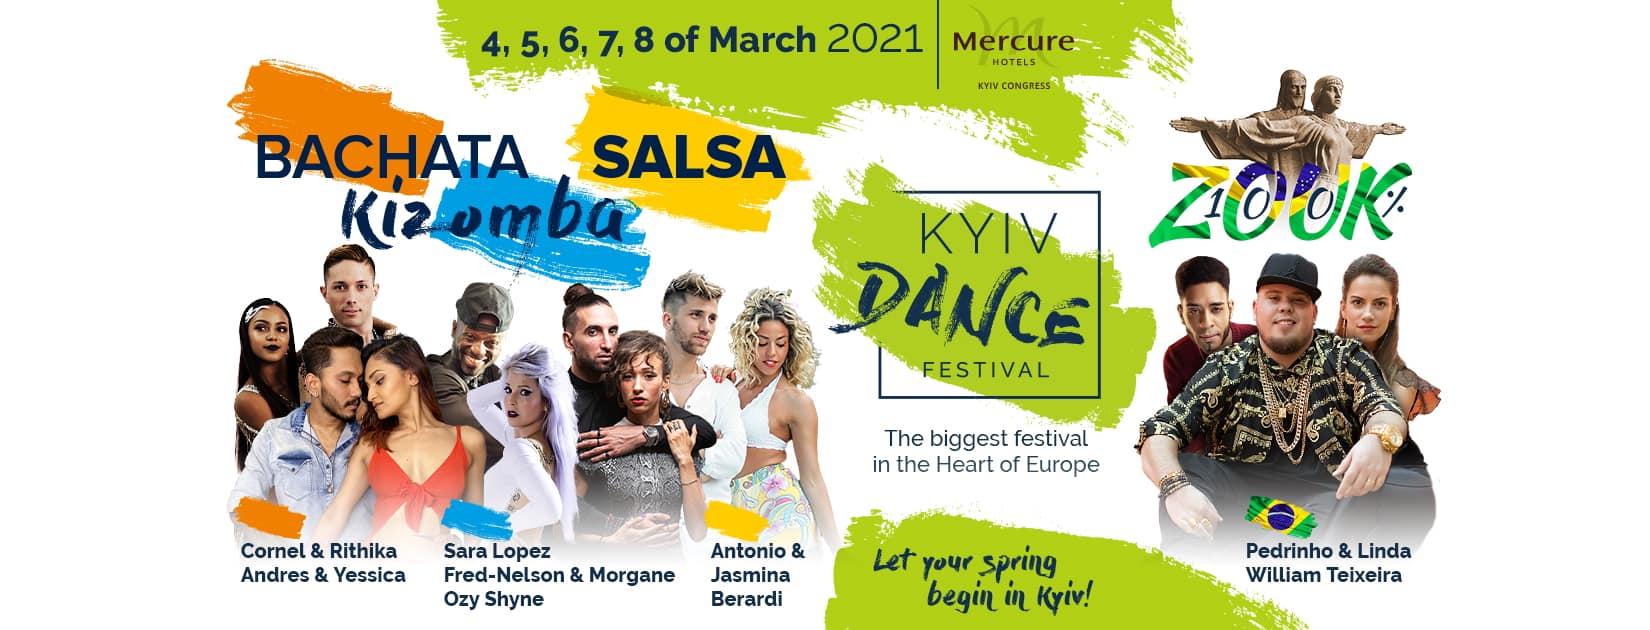 Kyiv Dance Festival 2021, Bachata Festival Ukraine